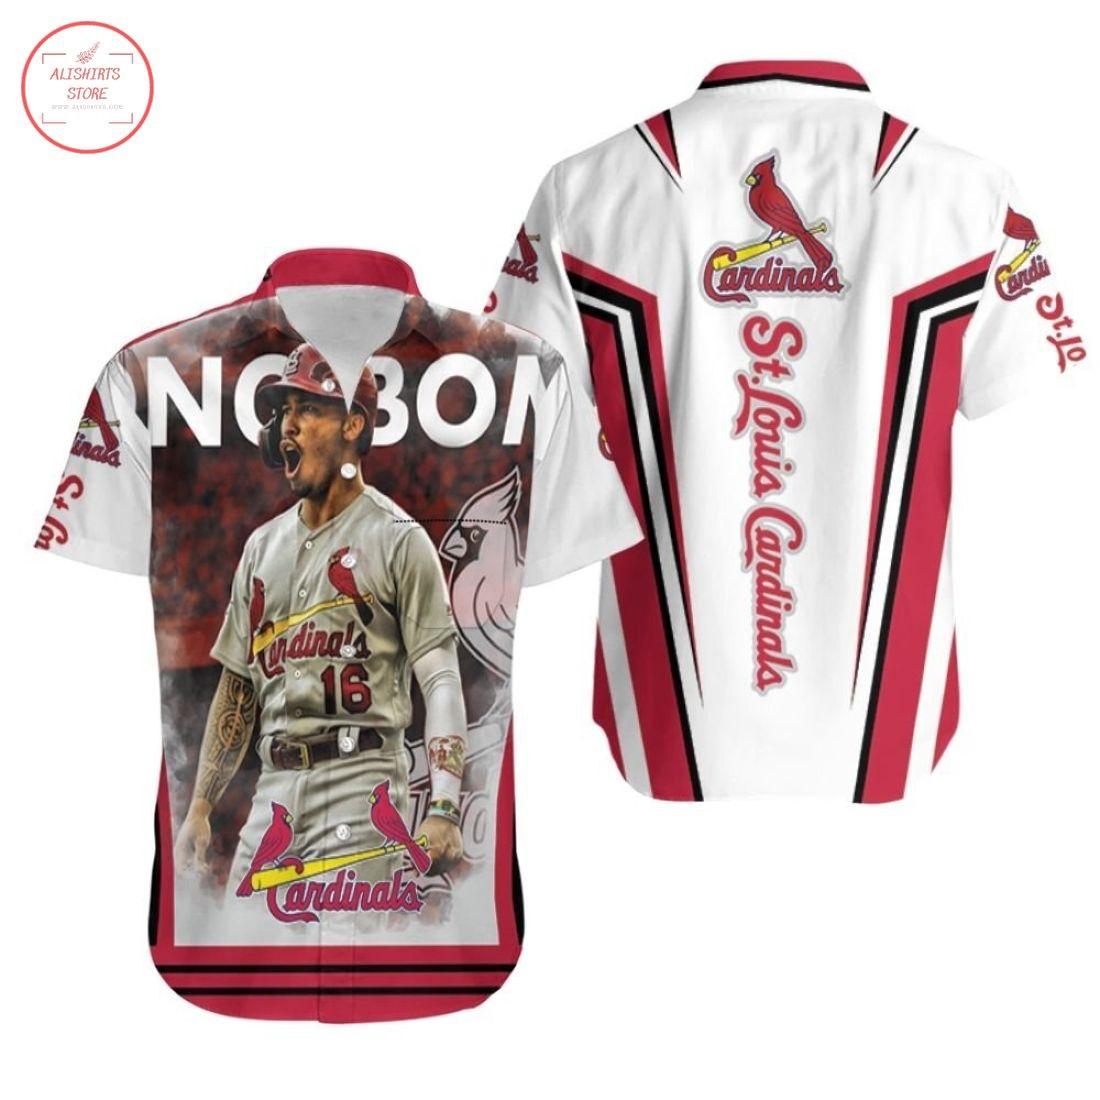 Kolten Wong St Louis Cardinals Hawaiian Shirts